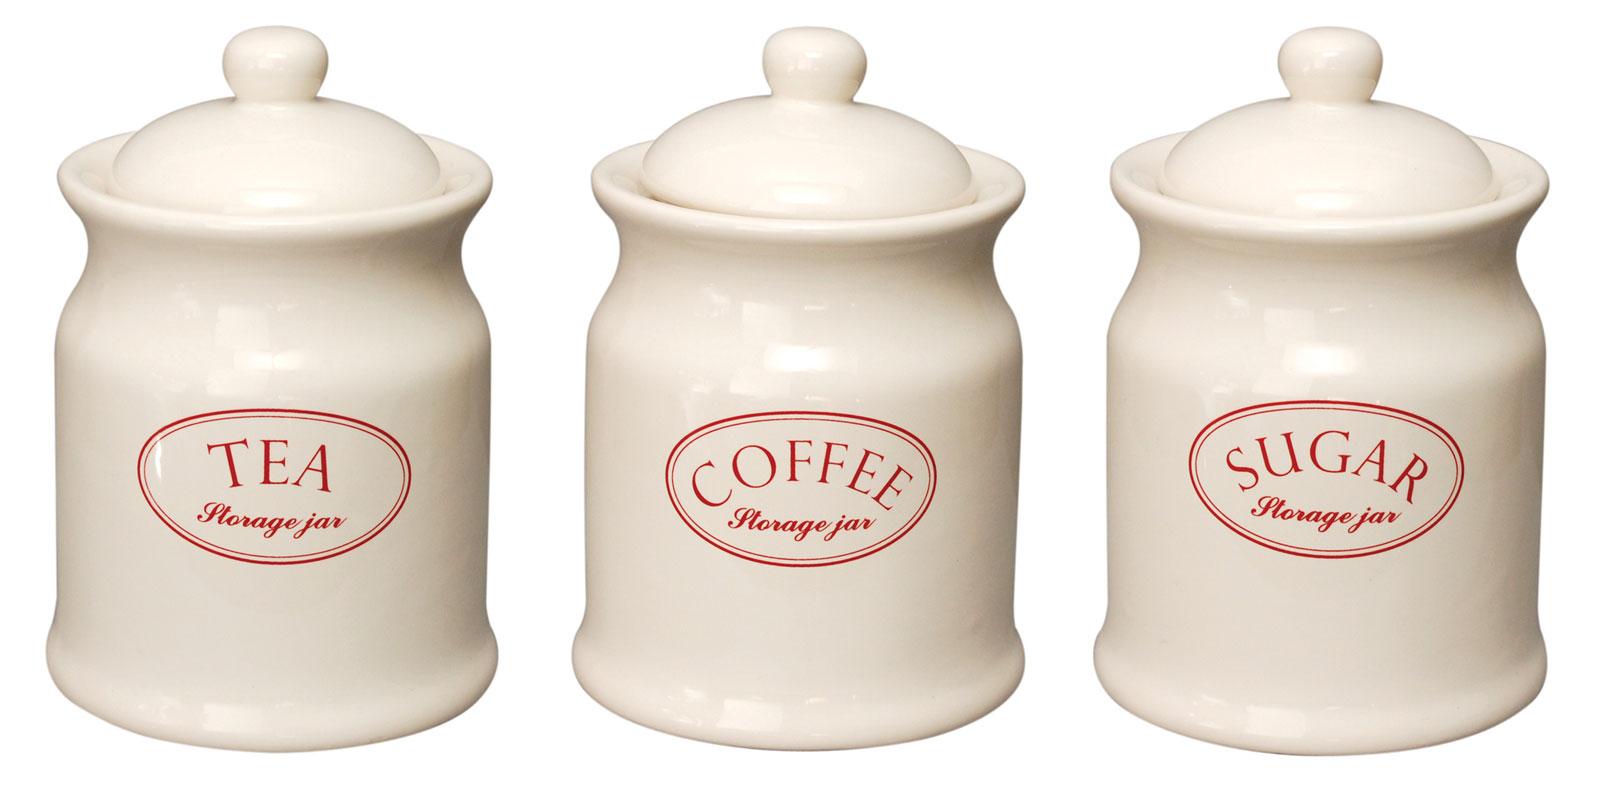 ascot cream ceramic tea coffee sugar kitchen storage jars. Black Bedroom Furniture Sets. Home Design Ideas